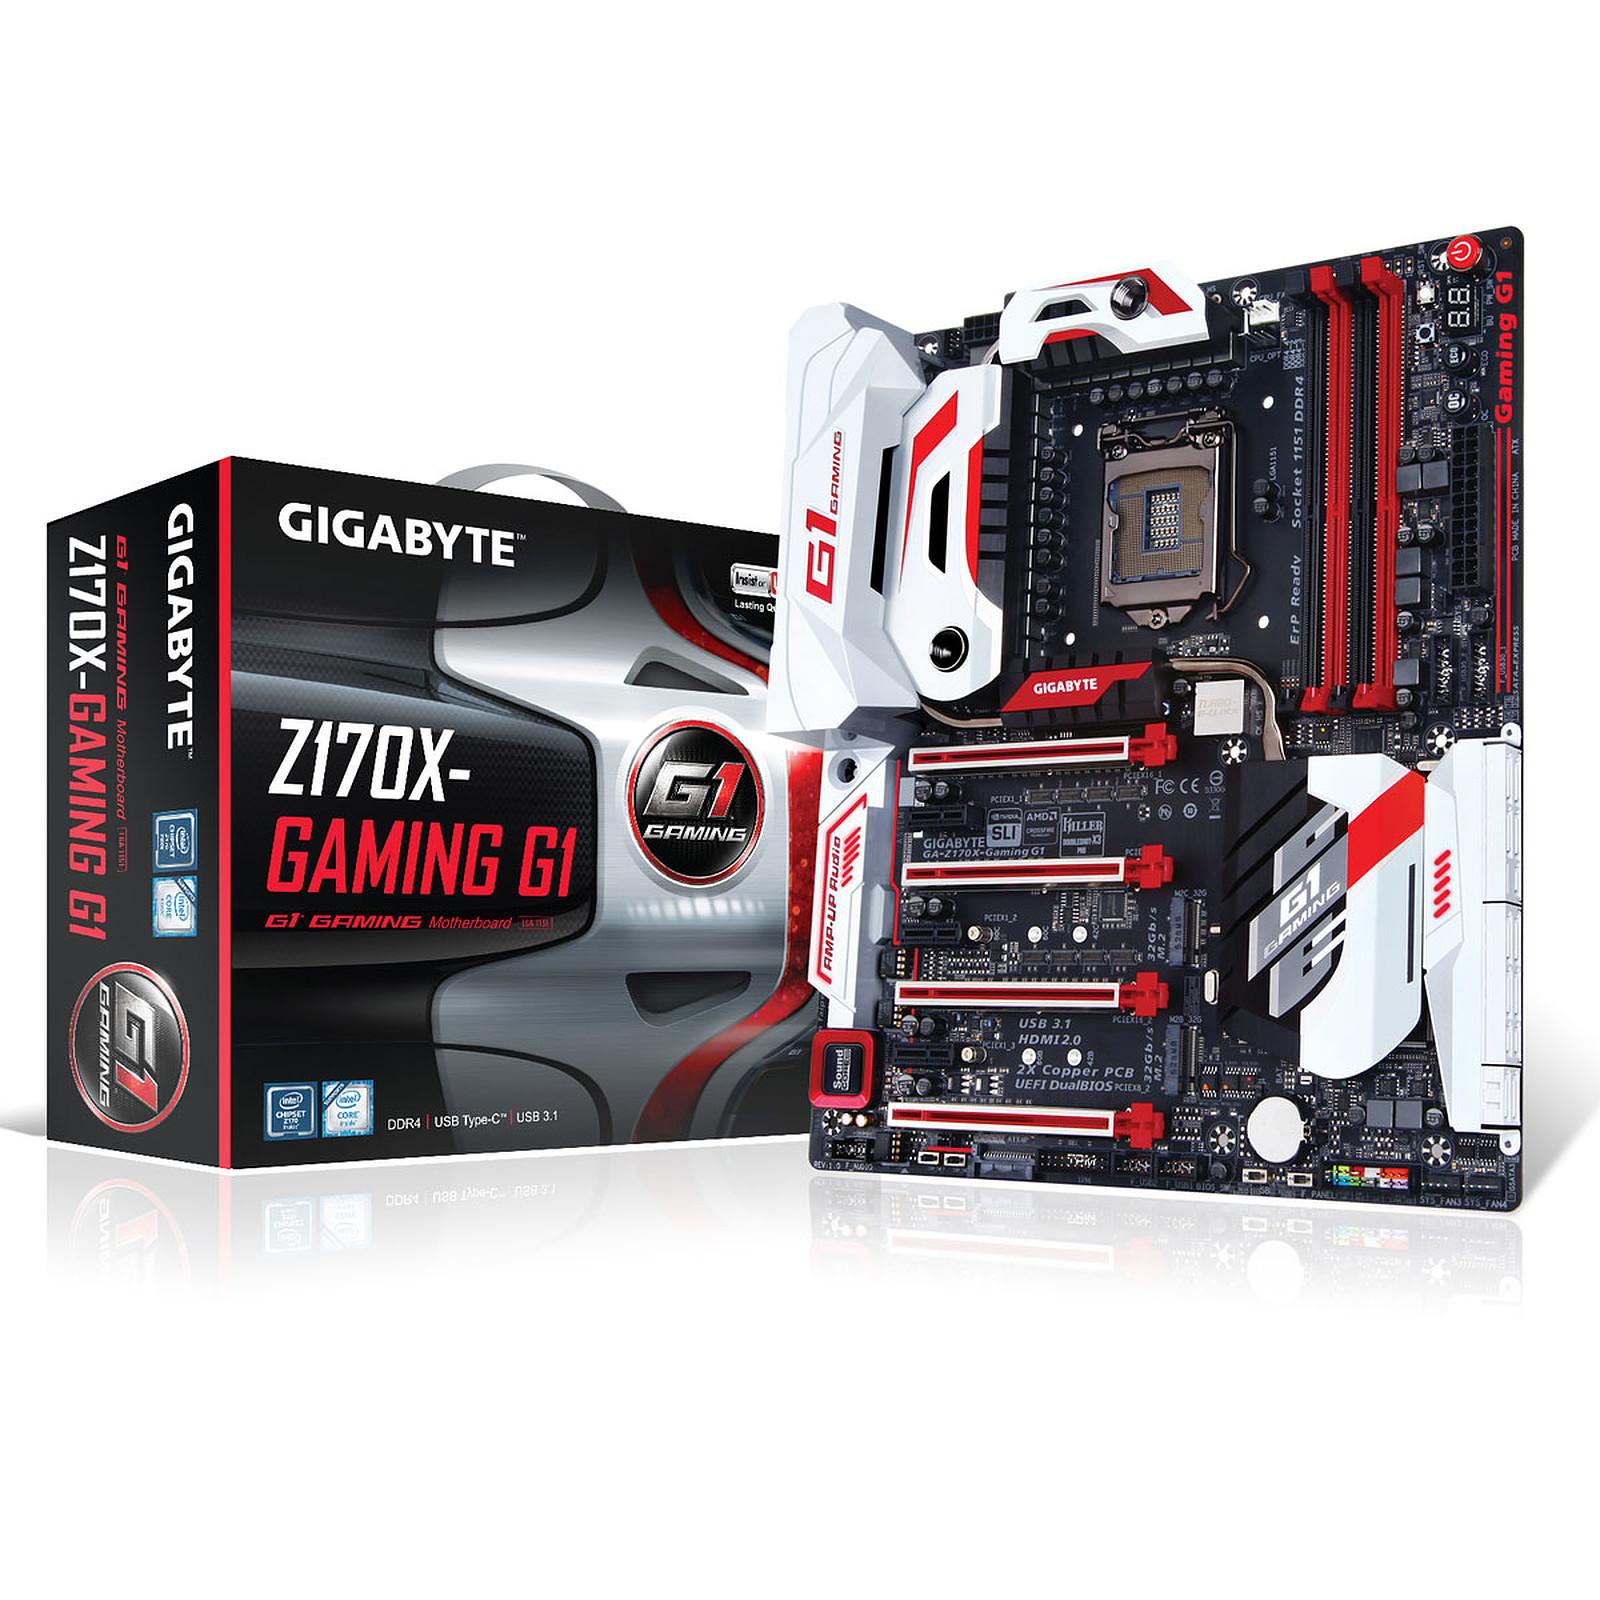 Gigabyte GA-Z170X-Gaming 1